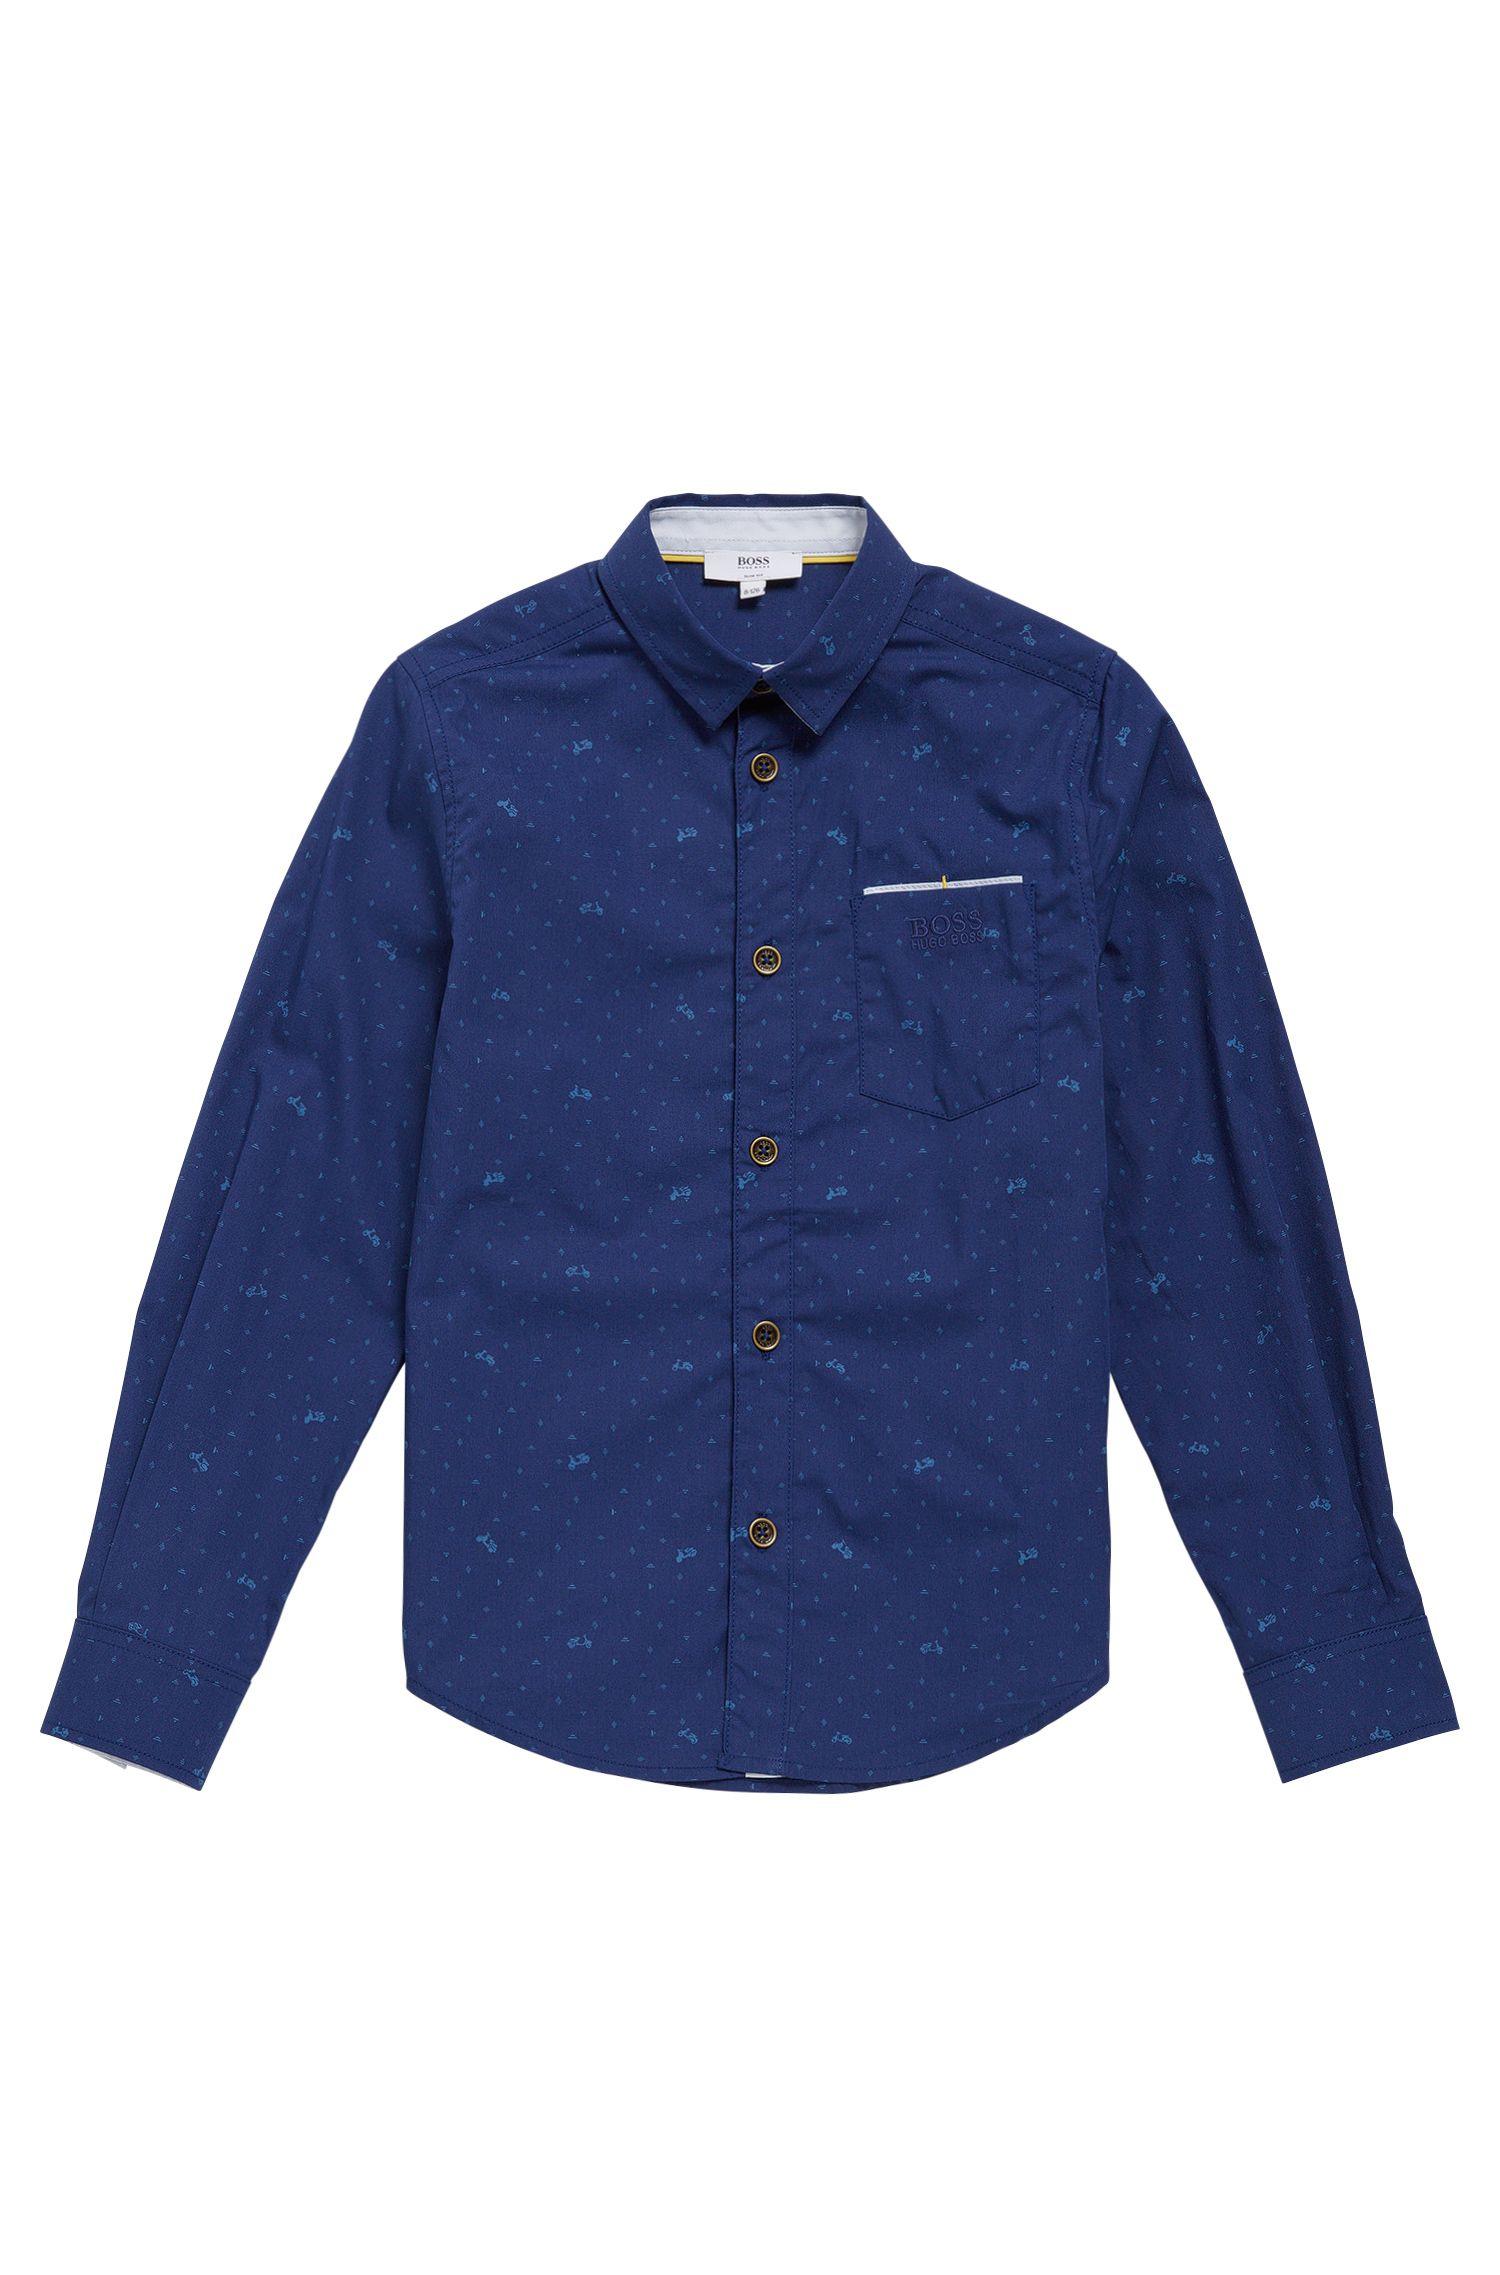 'J25991' | Boys Cotton Printed Button Down Shirt